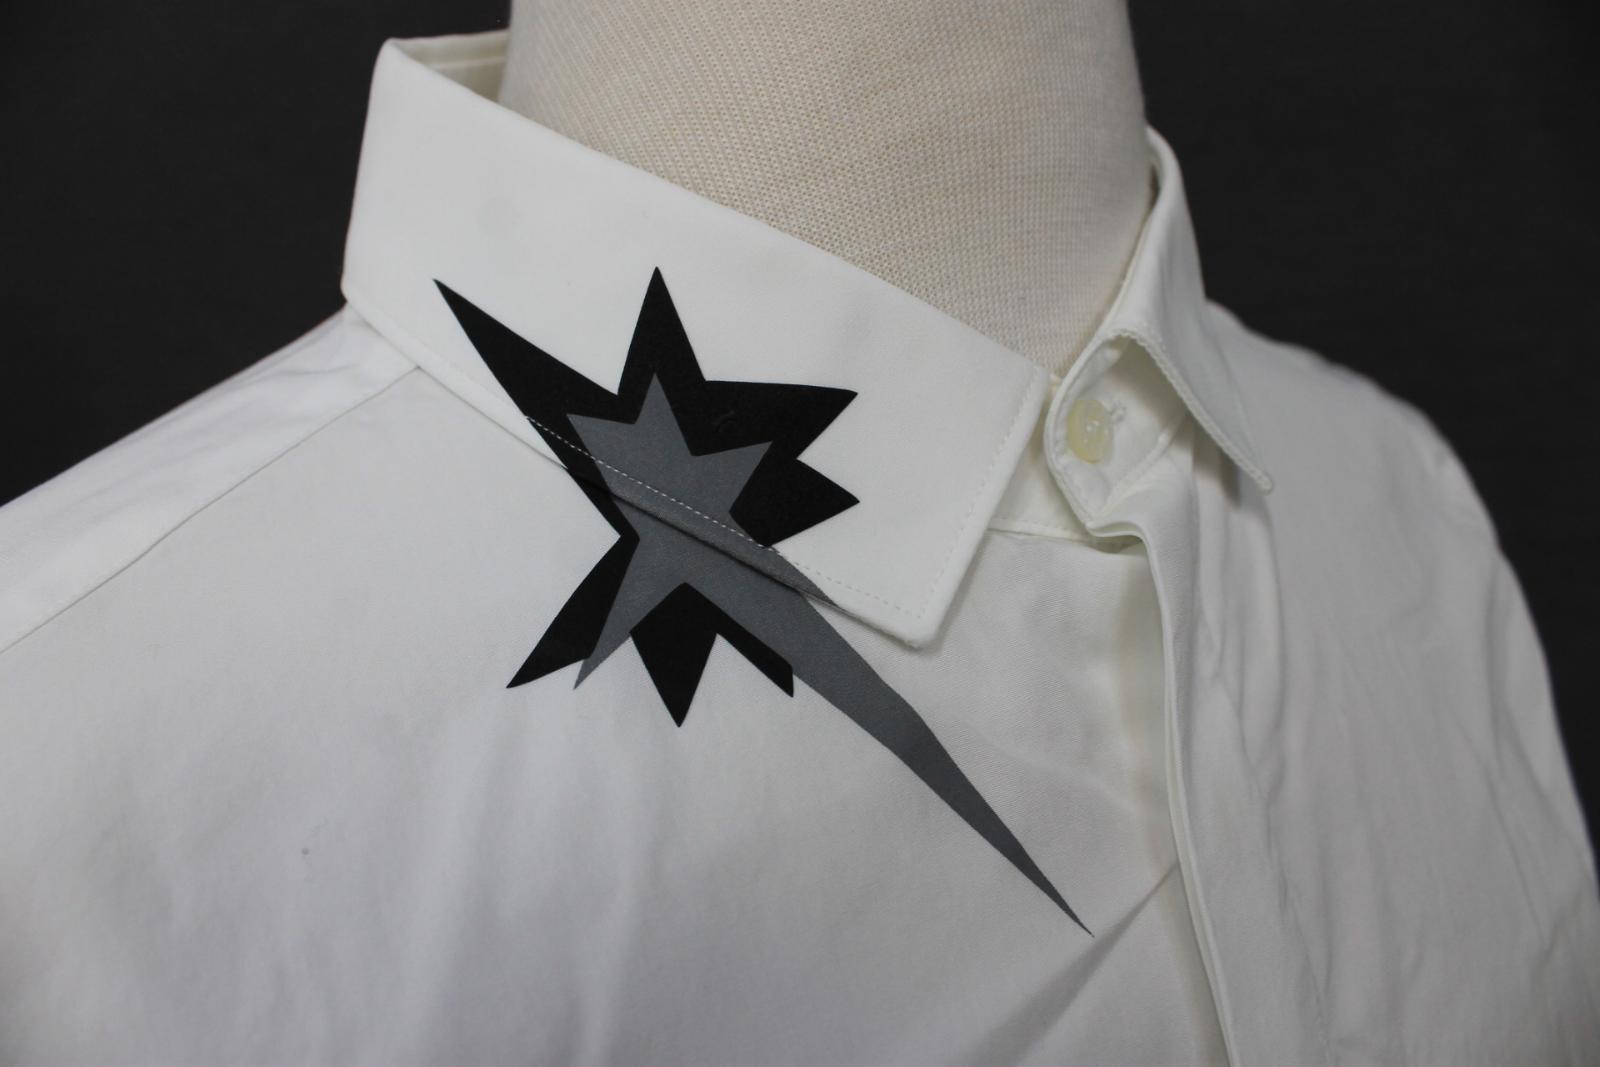 Neil-Barrett-para-hombre-calce-cenido-de-algodon-blanco-cuello-flash-camisa-de-manga-larga-talla-17 miniatura 8